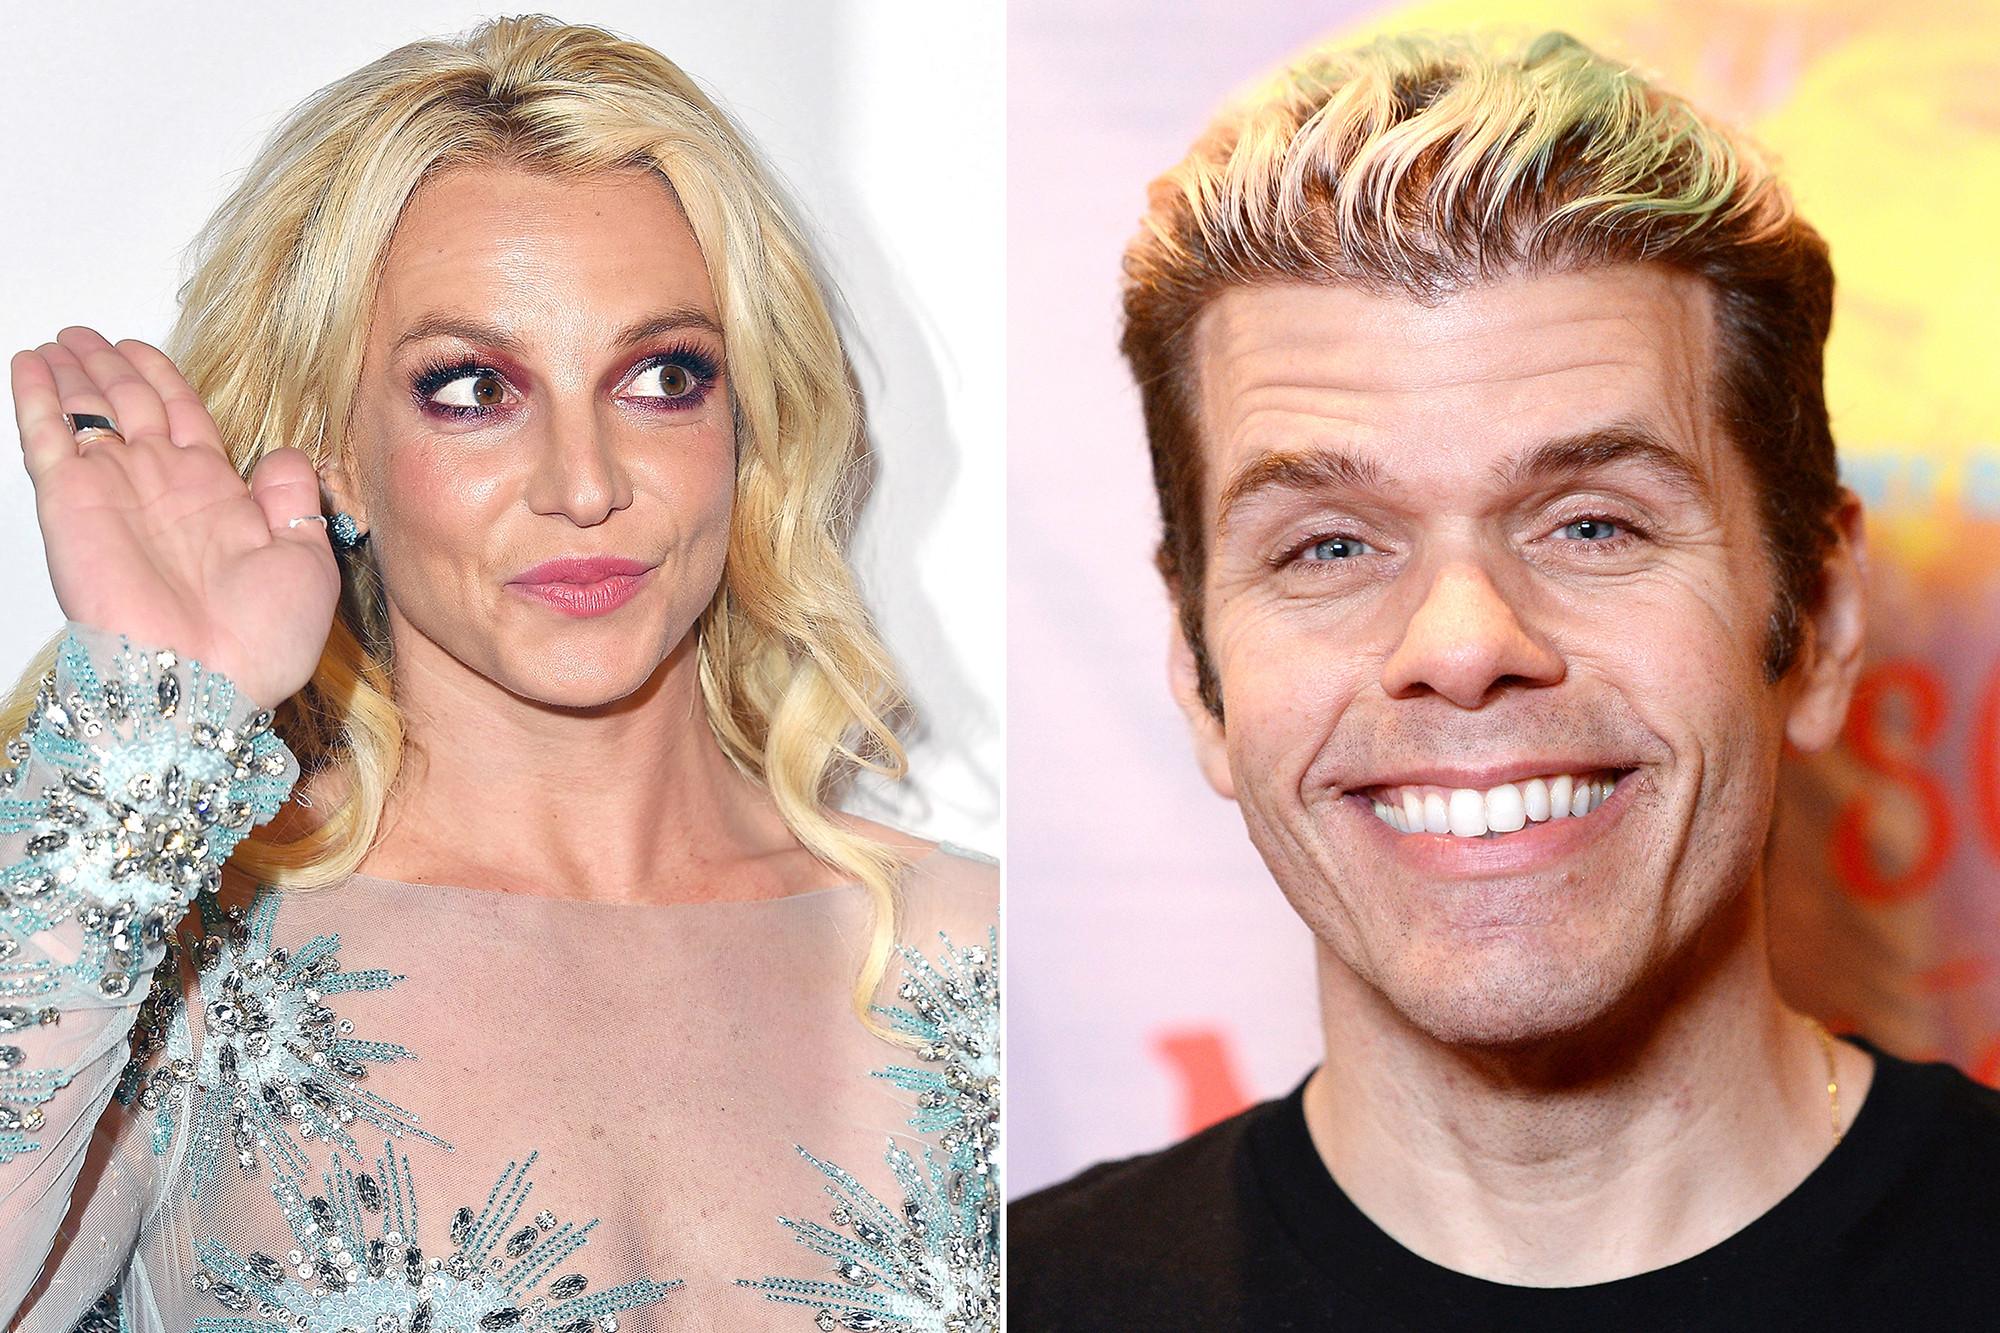 Perez Hilton expresses remorse over Britney Spears coverage